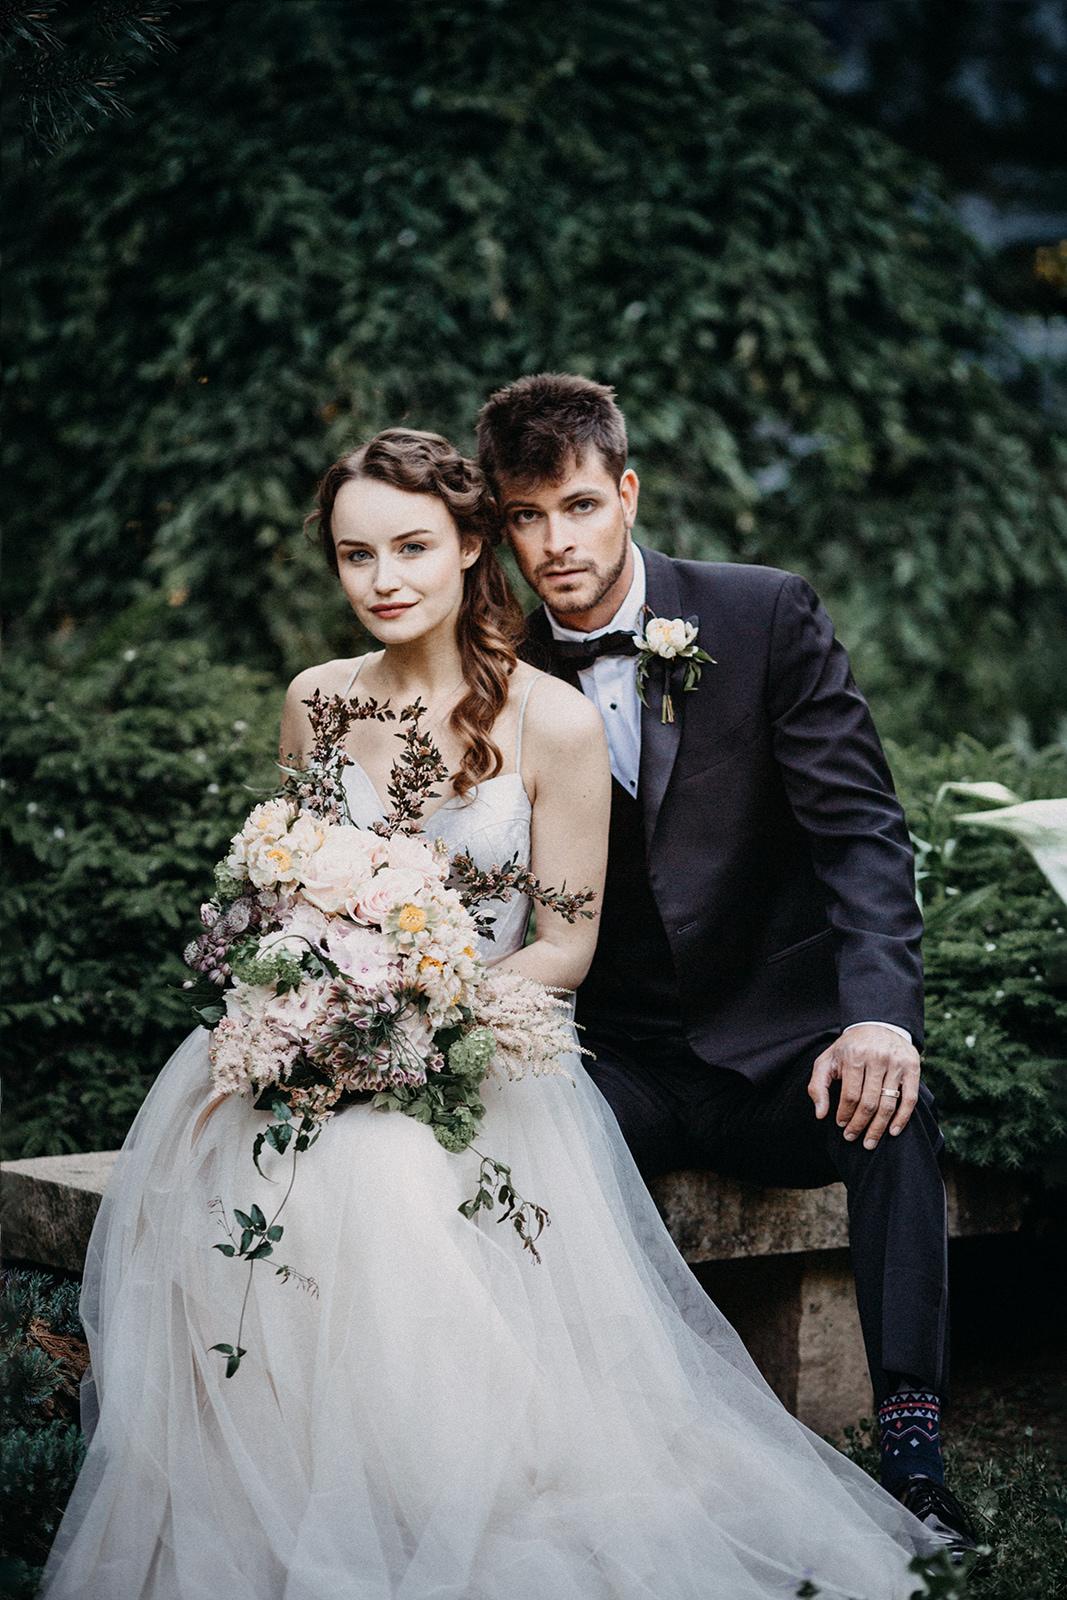 Romantic Bride andGroom Portrait Chicago Wedding lisa kathan photography